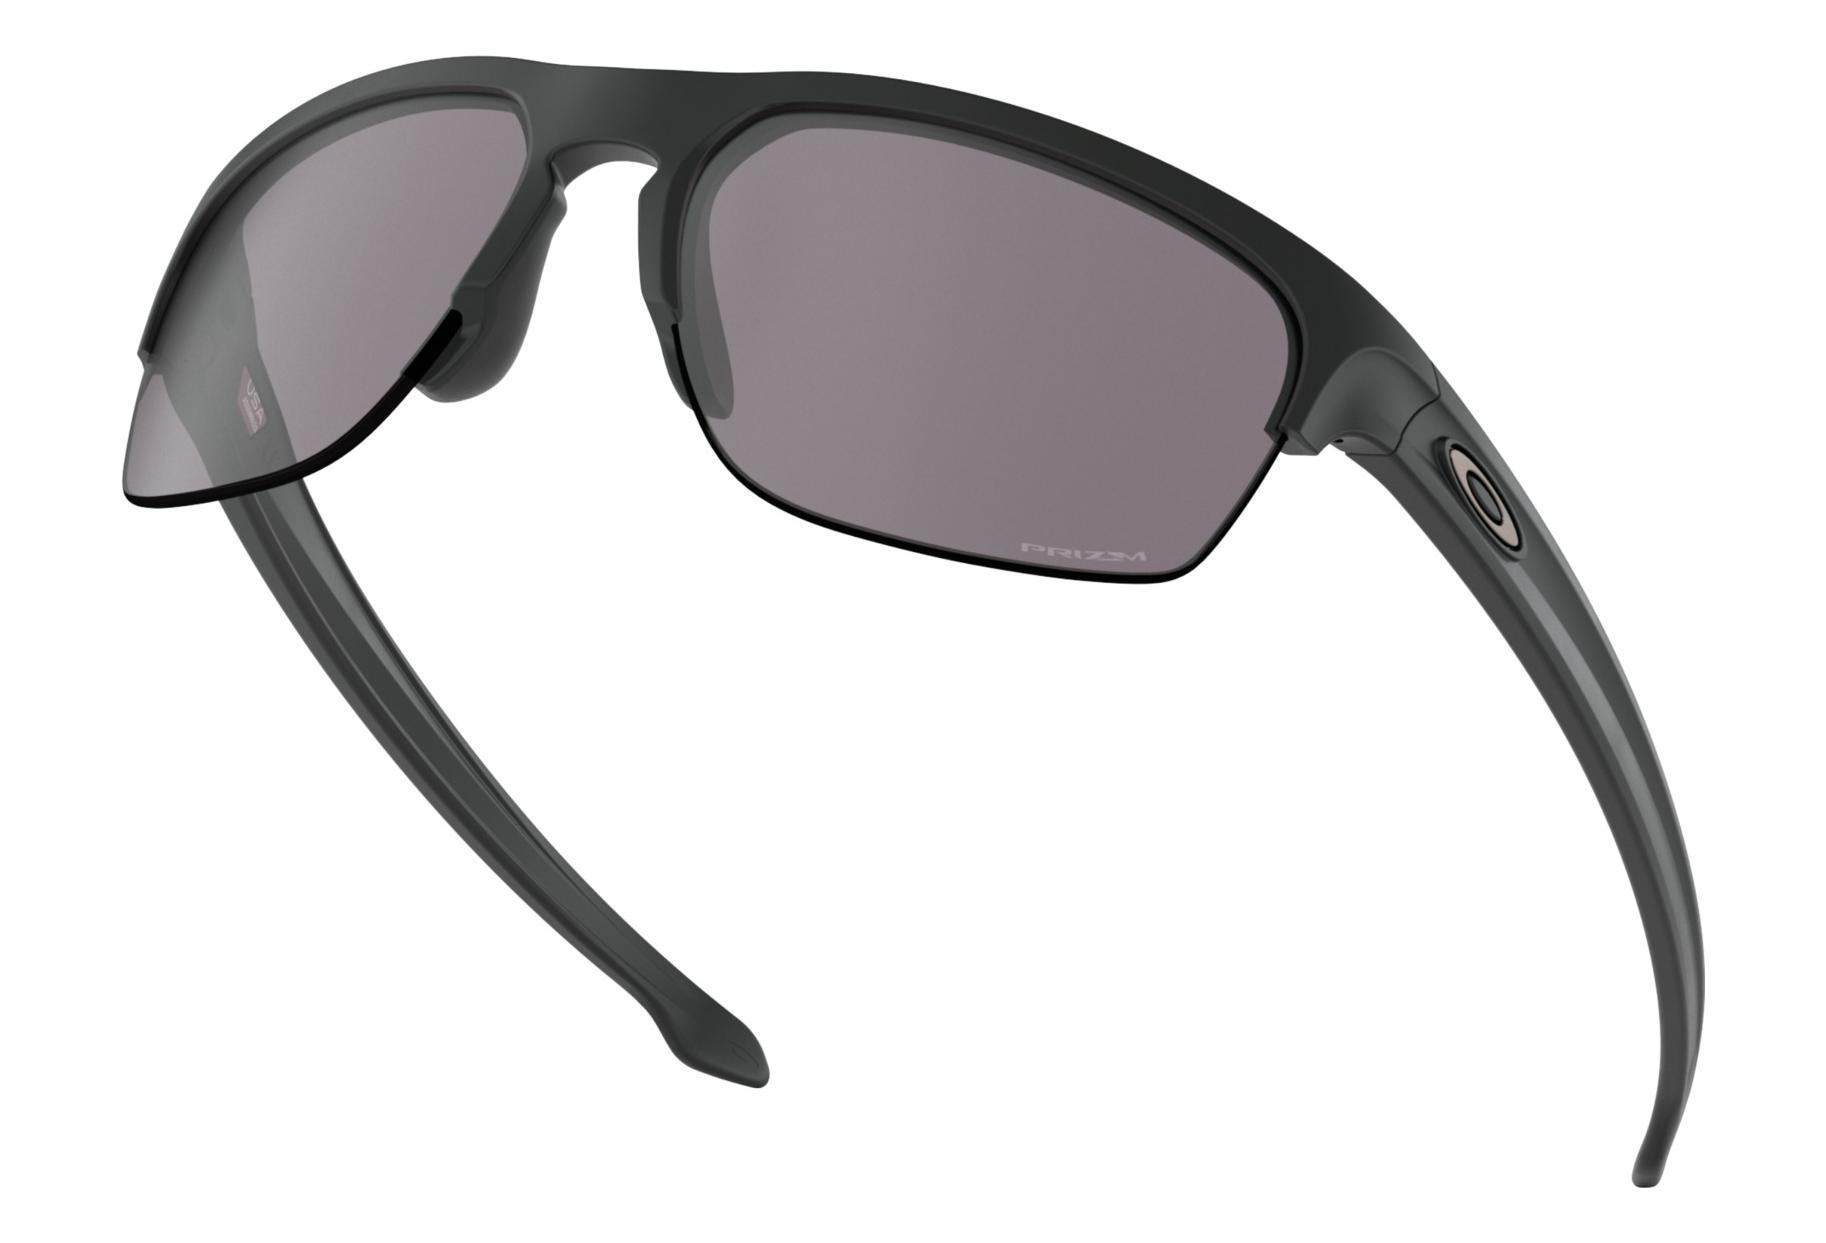 Oakley Sunglasses Sliver Edge Matte Black   Prizm Grey  37e3c65f39